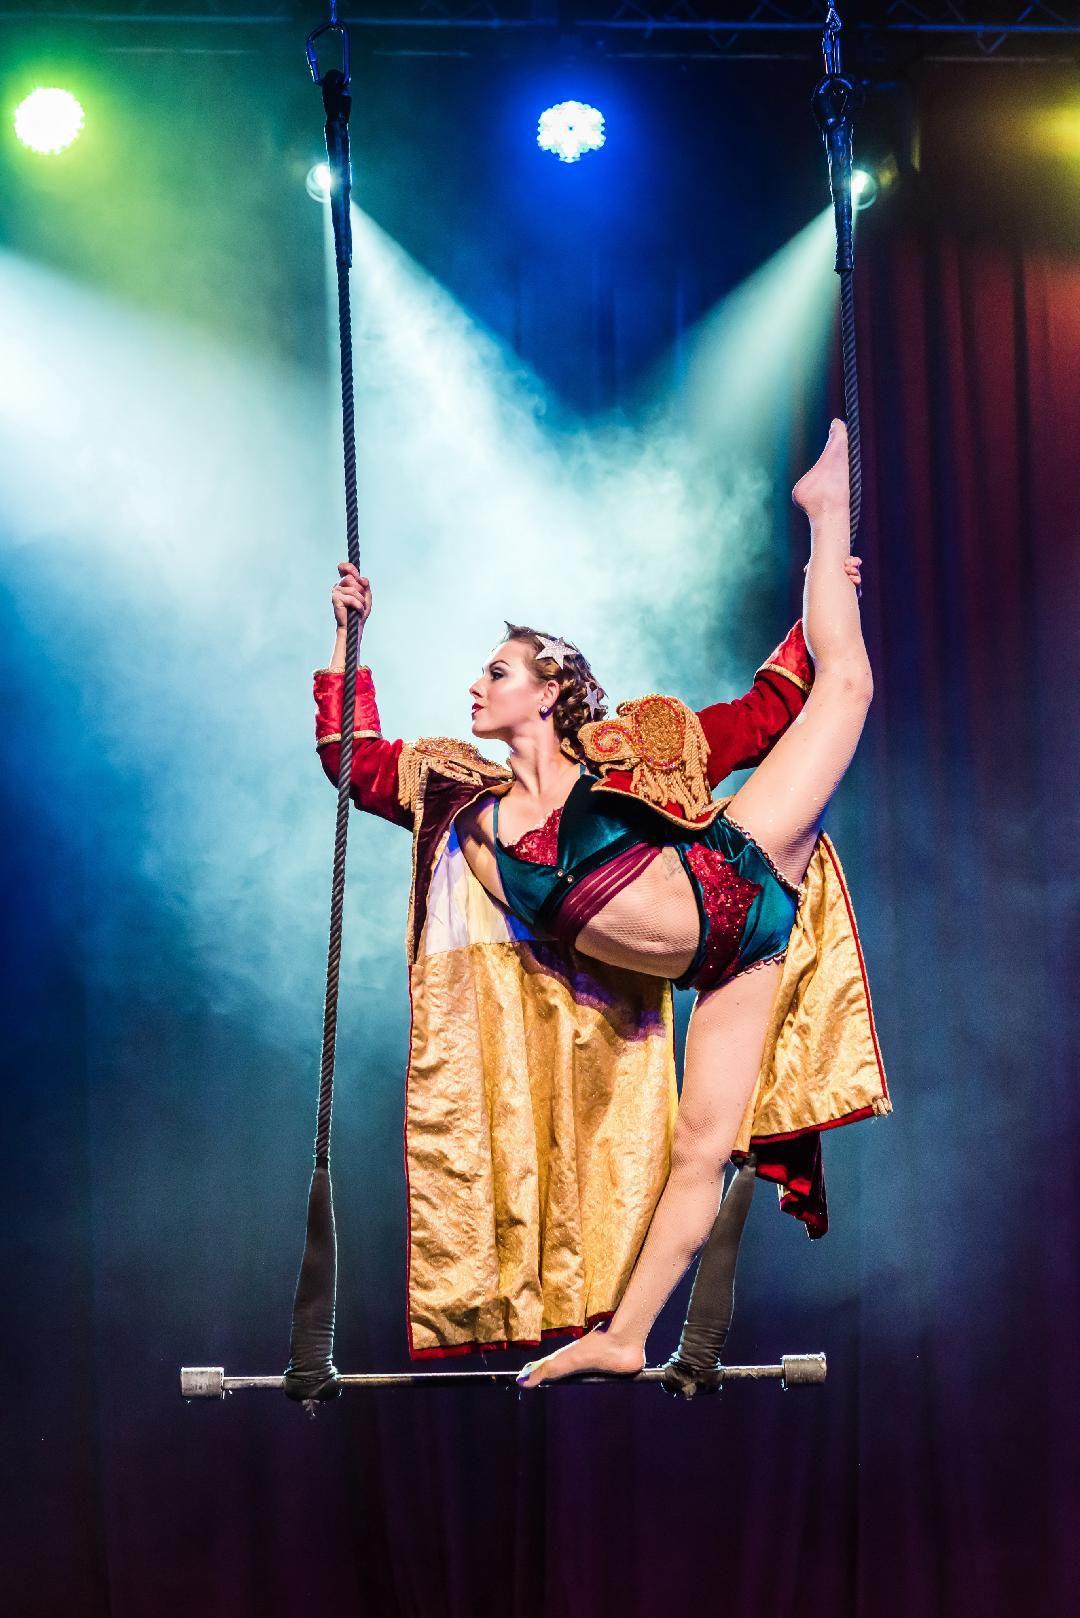 Aerialist performs at Cirque Mechanics